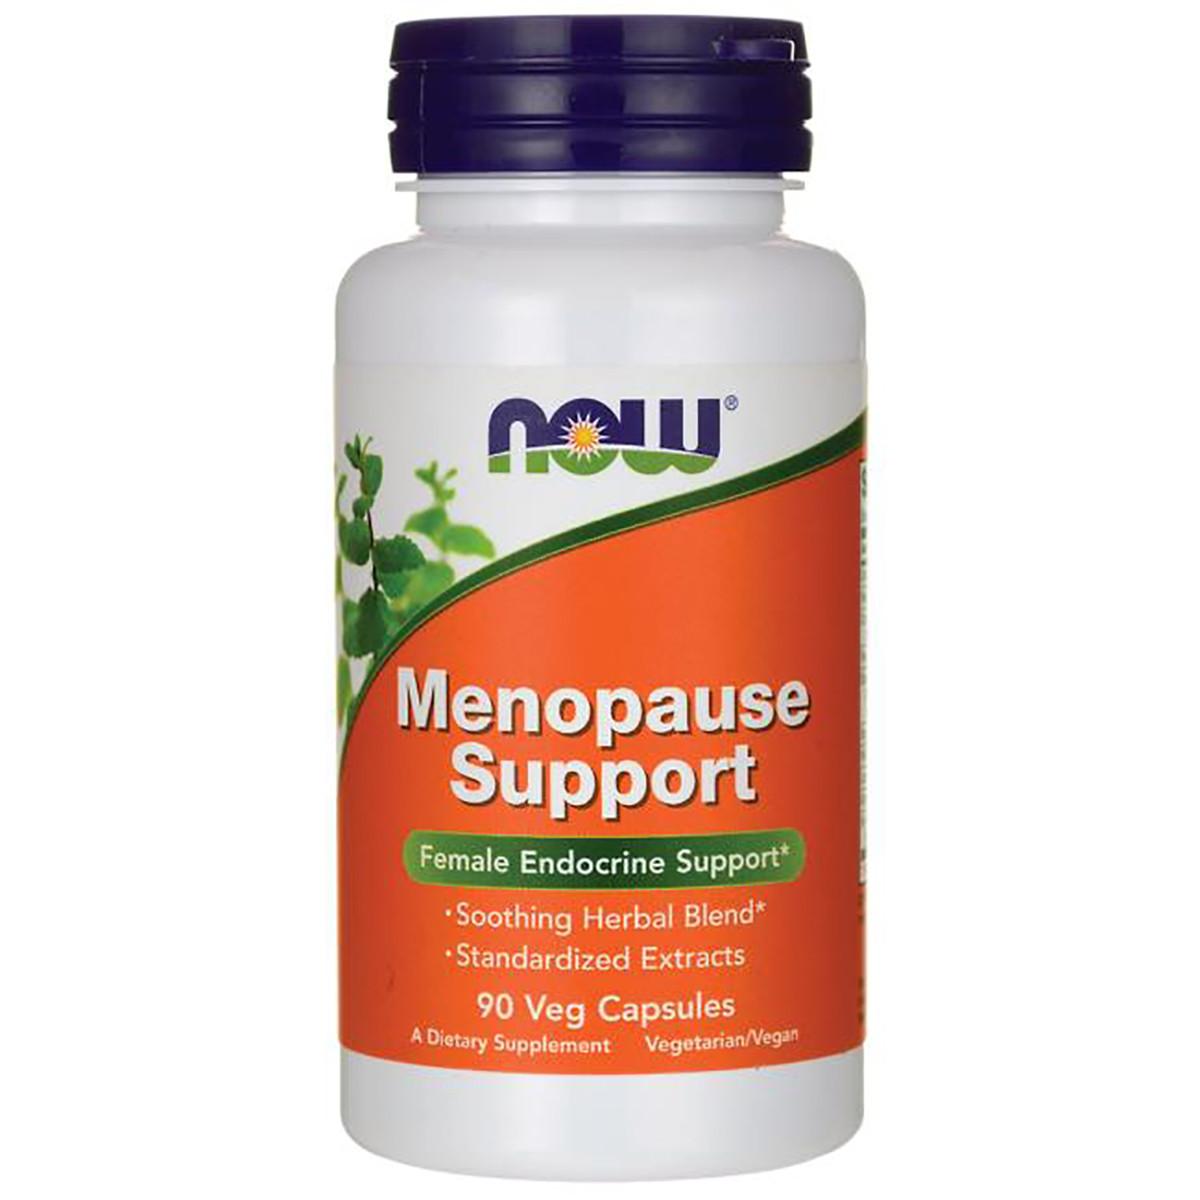 Менопауза, Травяной Комплекс, Menopause Support, Now Foods, 90 капсул